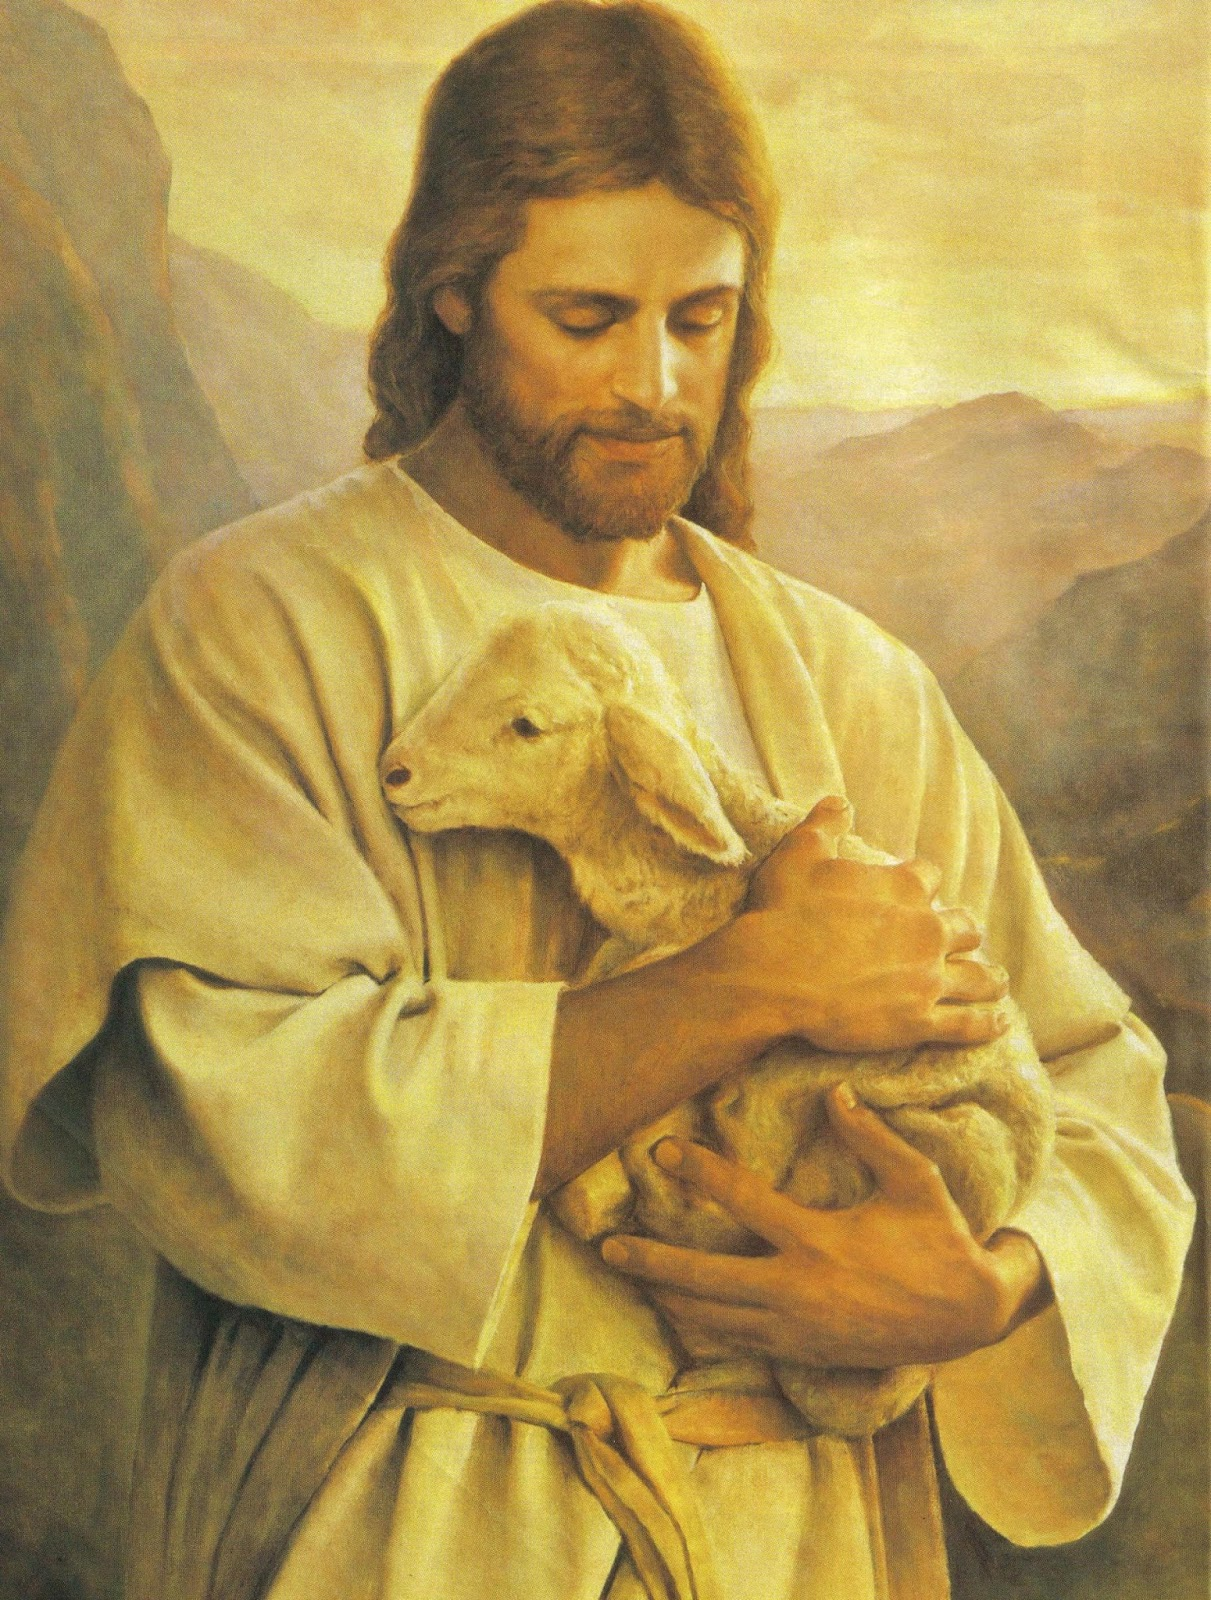 https://4.bp.blogspot.com/-eIUl53MhHRQ/VxT9k0Pr3HI/AAAAAAAAO88/fGifxI24g9gm3xkxa5HYEDEKXVzBgo1eACLcB/s1600/Jesus-Good-Shepherd-06.jpg